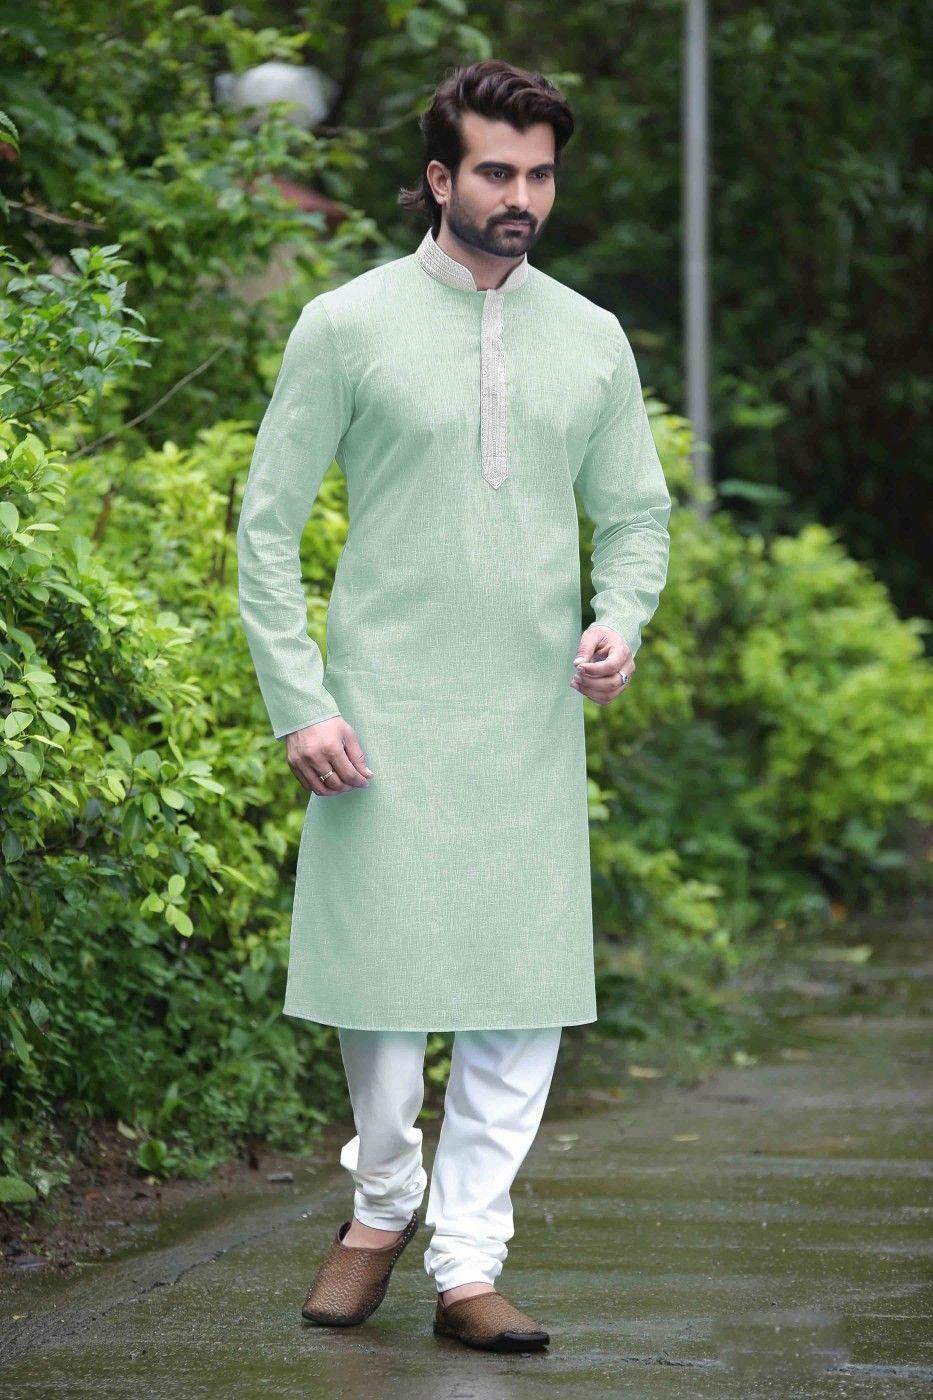 da9f411688 Light Green Cotton Silk Designer Kurta Pyjama sku:518767 Make ankle or  floor length and we have a wizards robe wizarding fashion magical style